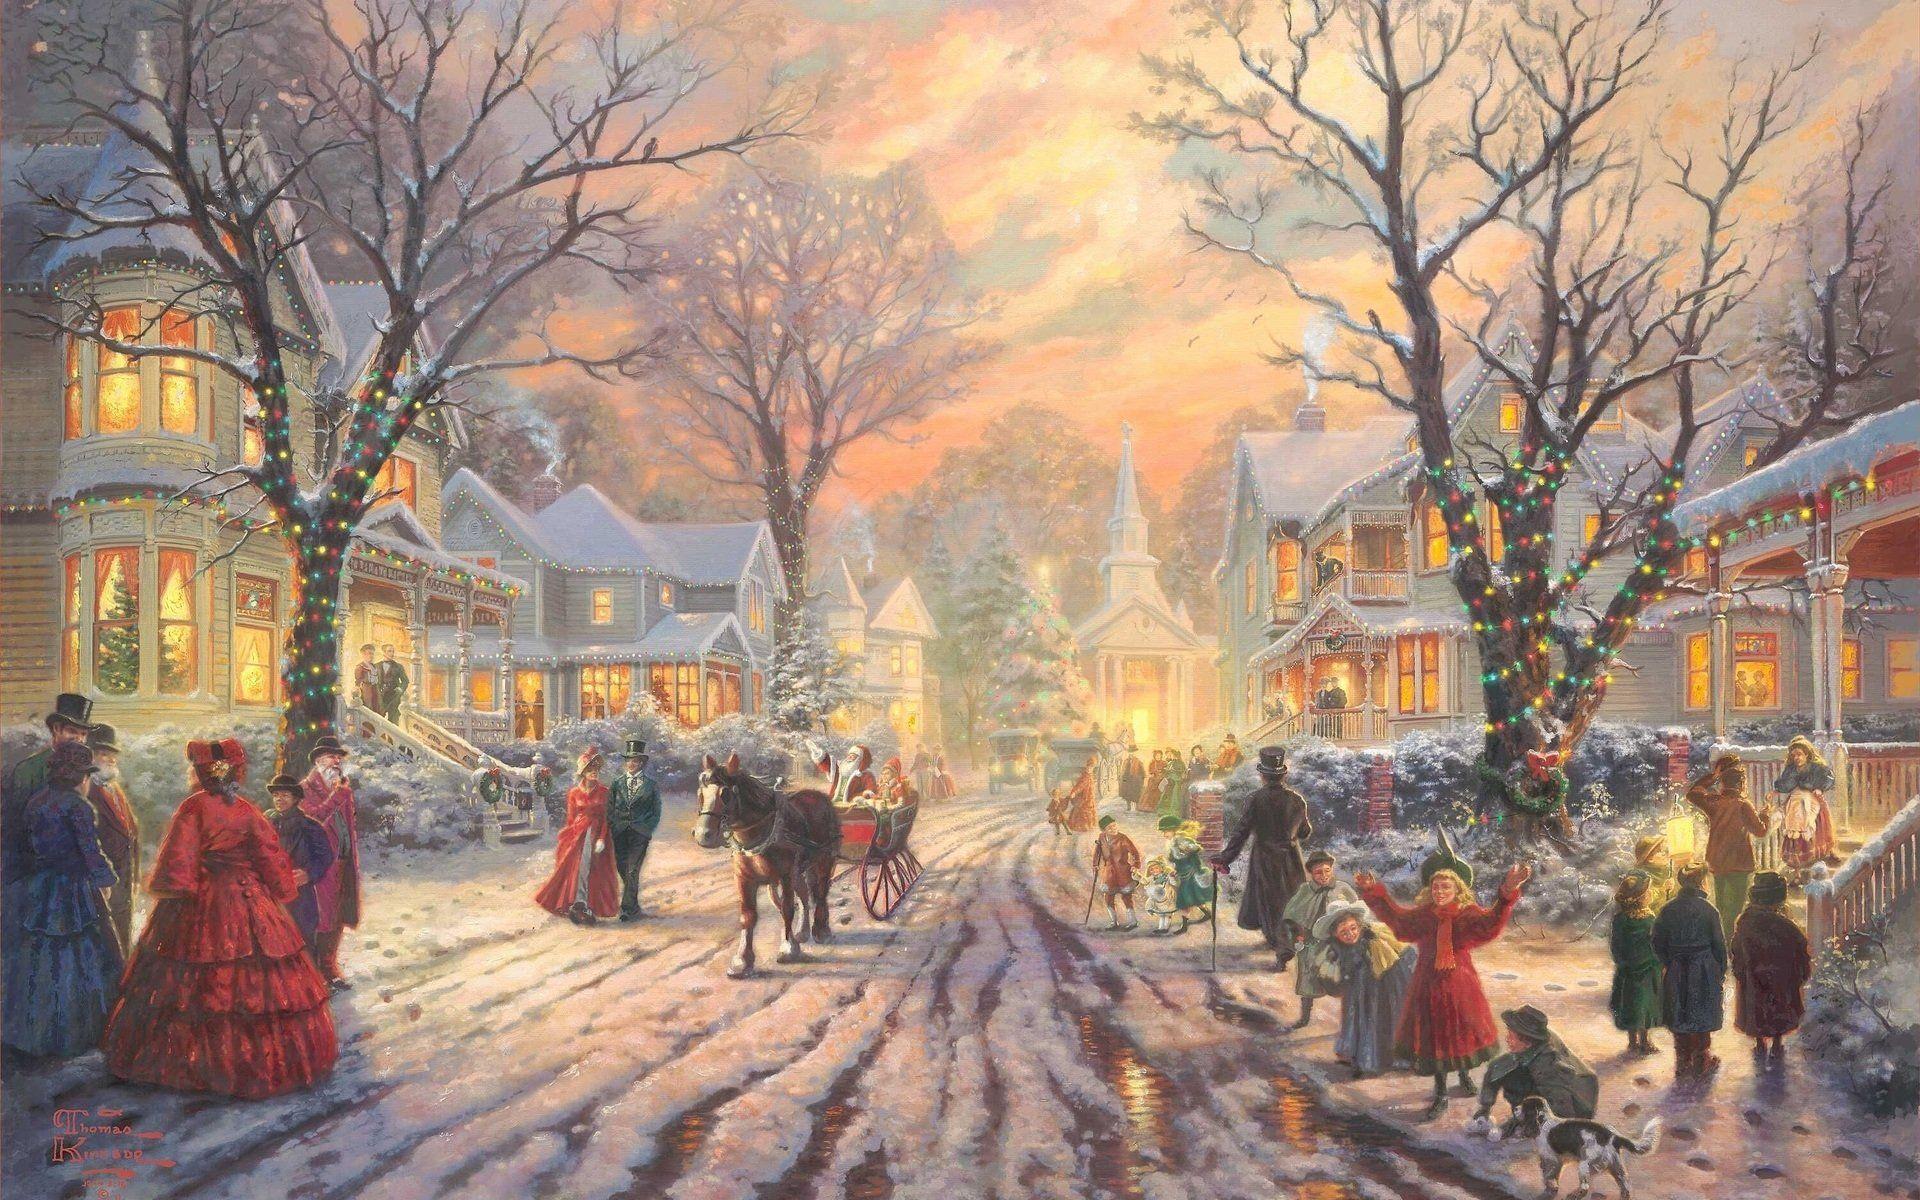 Holiday Christmas Village Painting Christmas Lights Santa Wallpaper ...